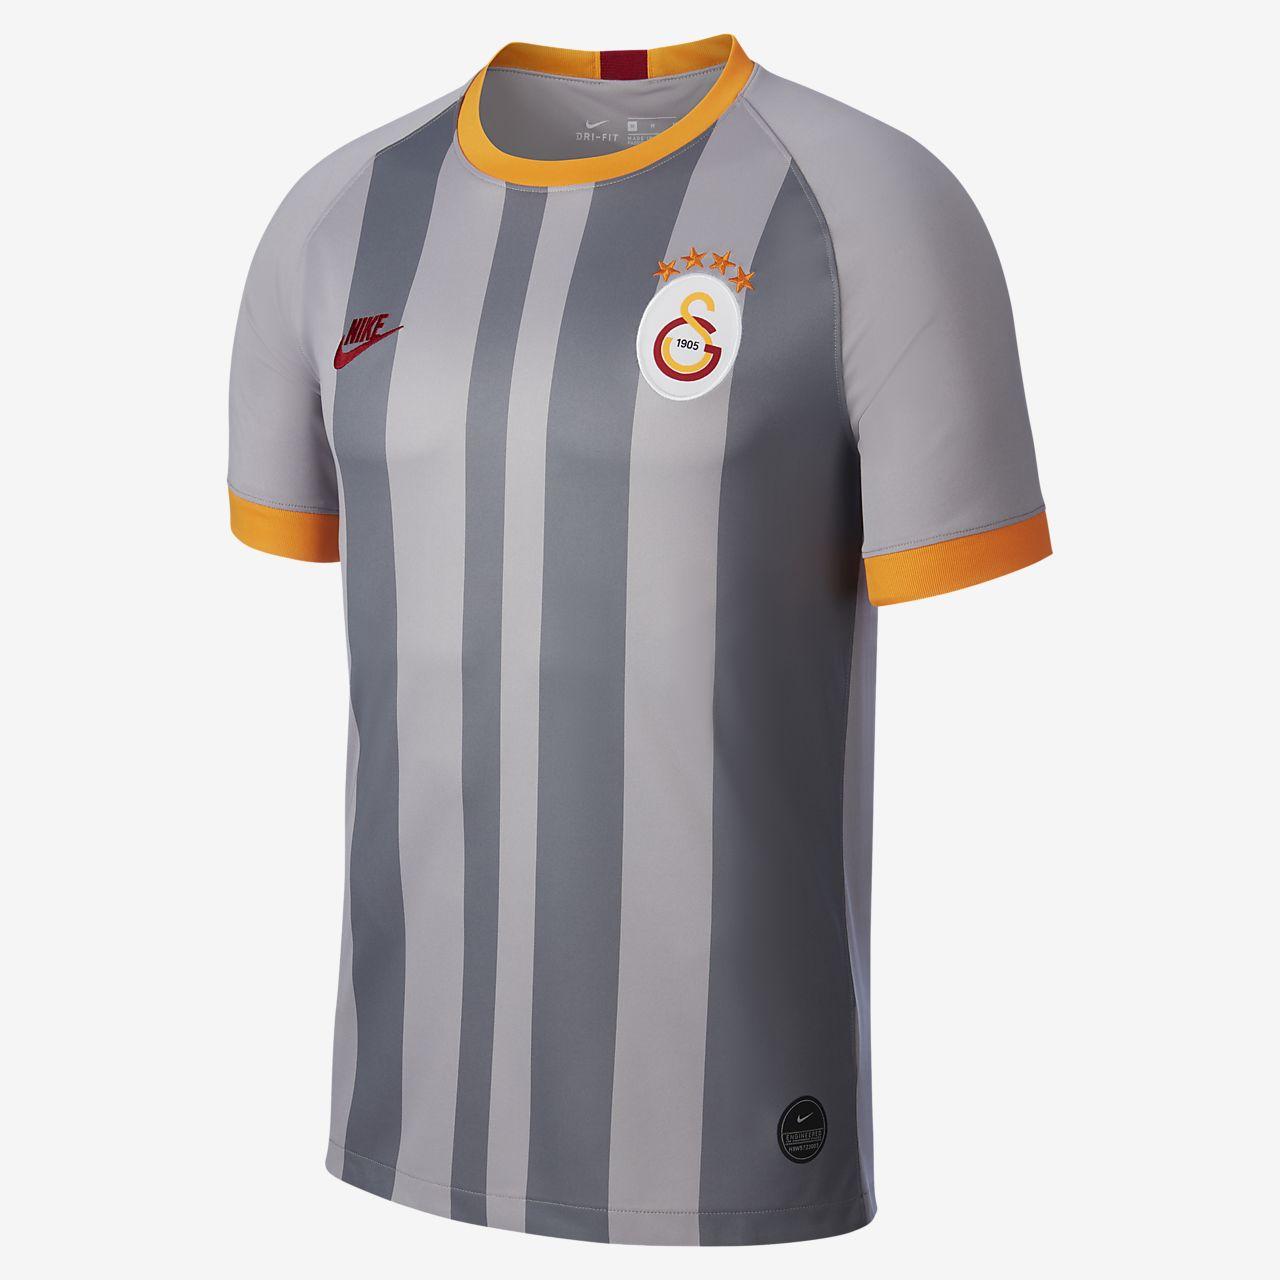 Maillot de football Galatasaray 2019/20 Stadium Third pour Homme